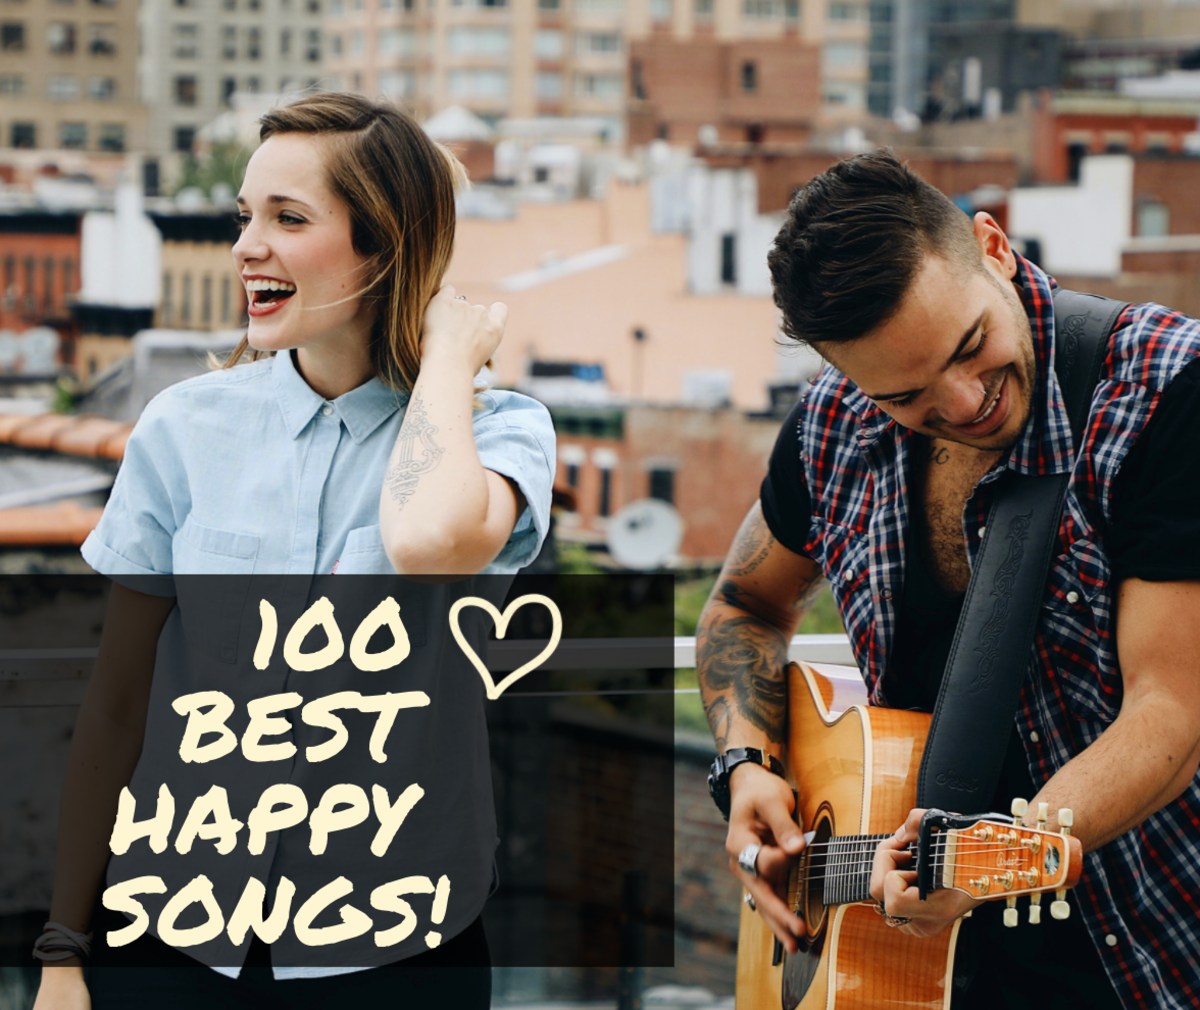 100 Best Happy Songs